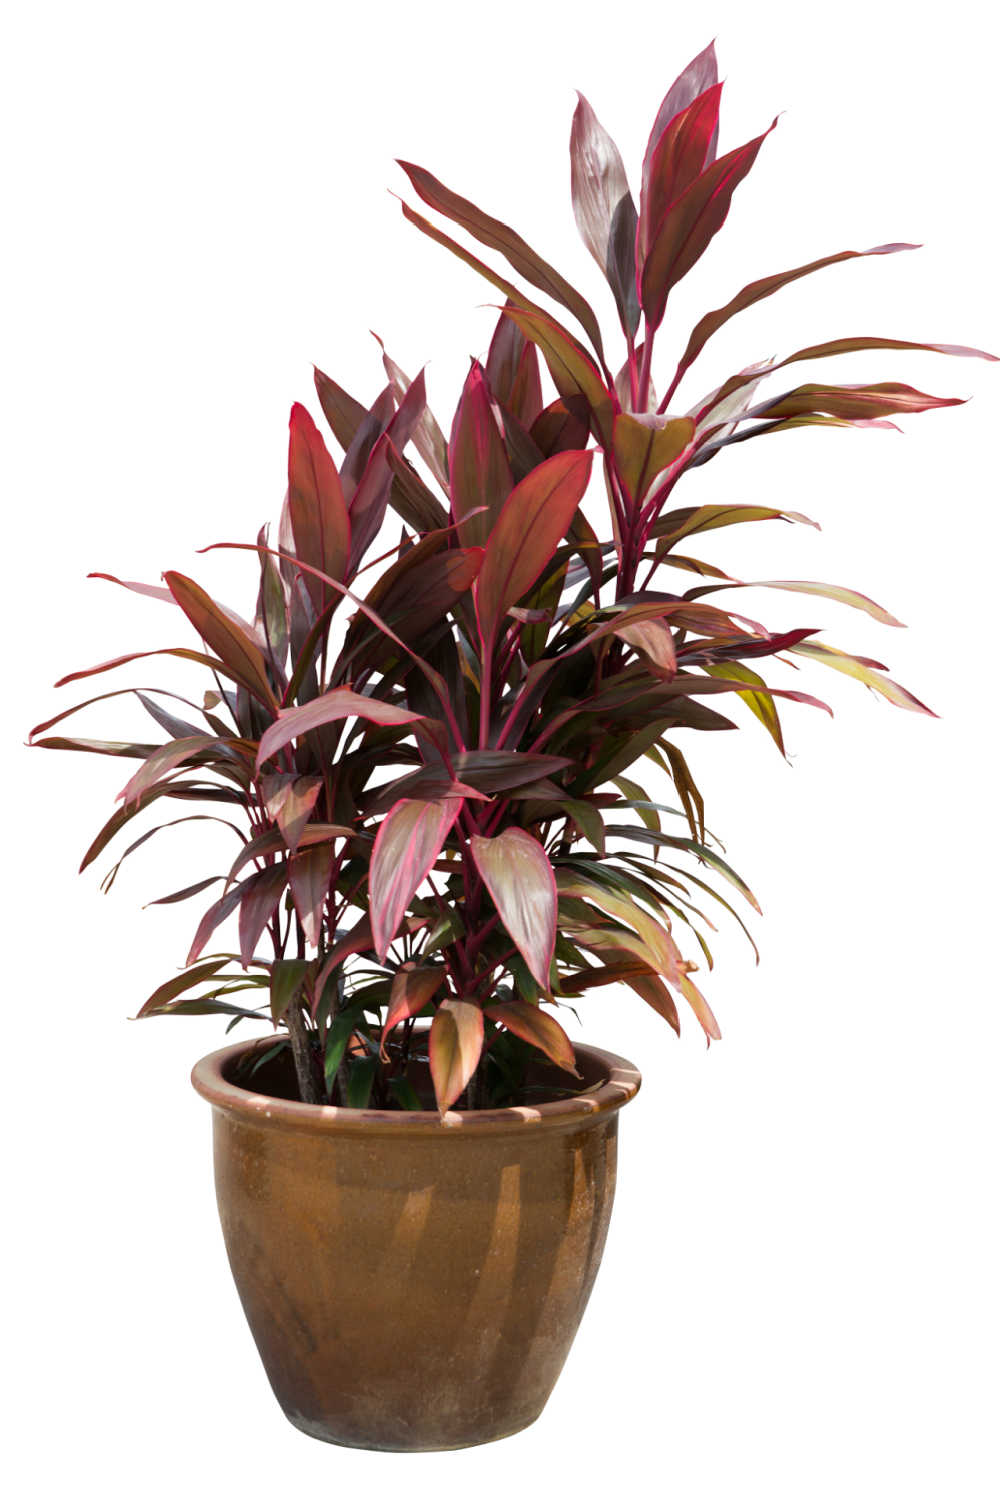 Hawaiian Ti in a bronze colored pot.